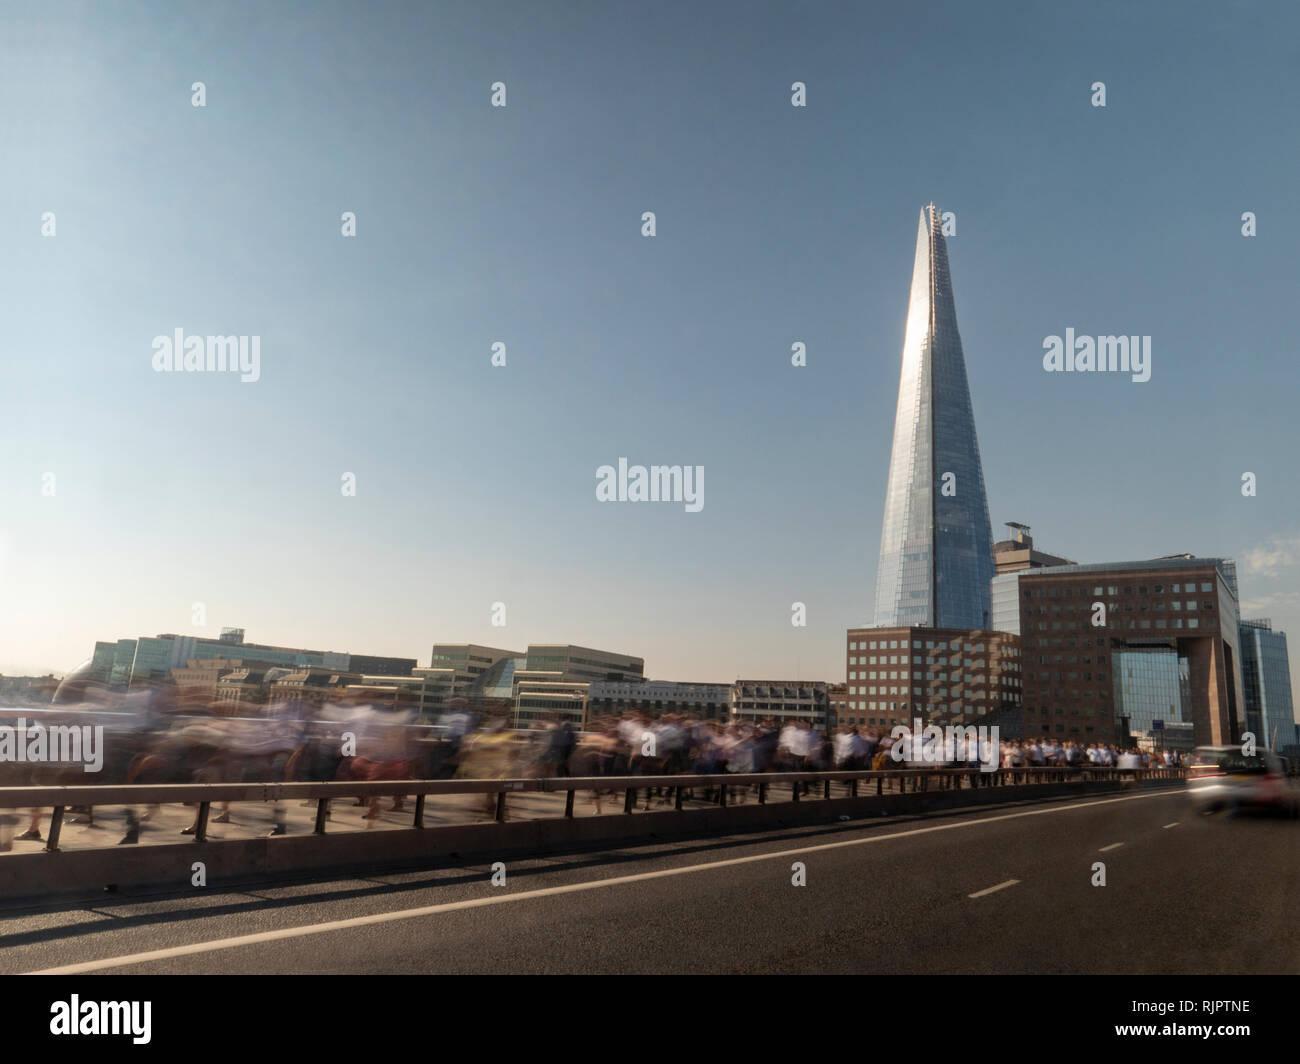 People walking along London Bridge, London, UK - Stock Image